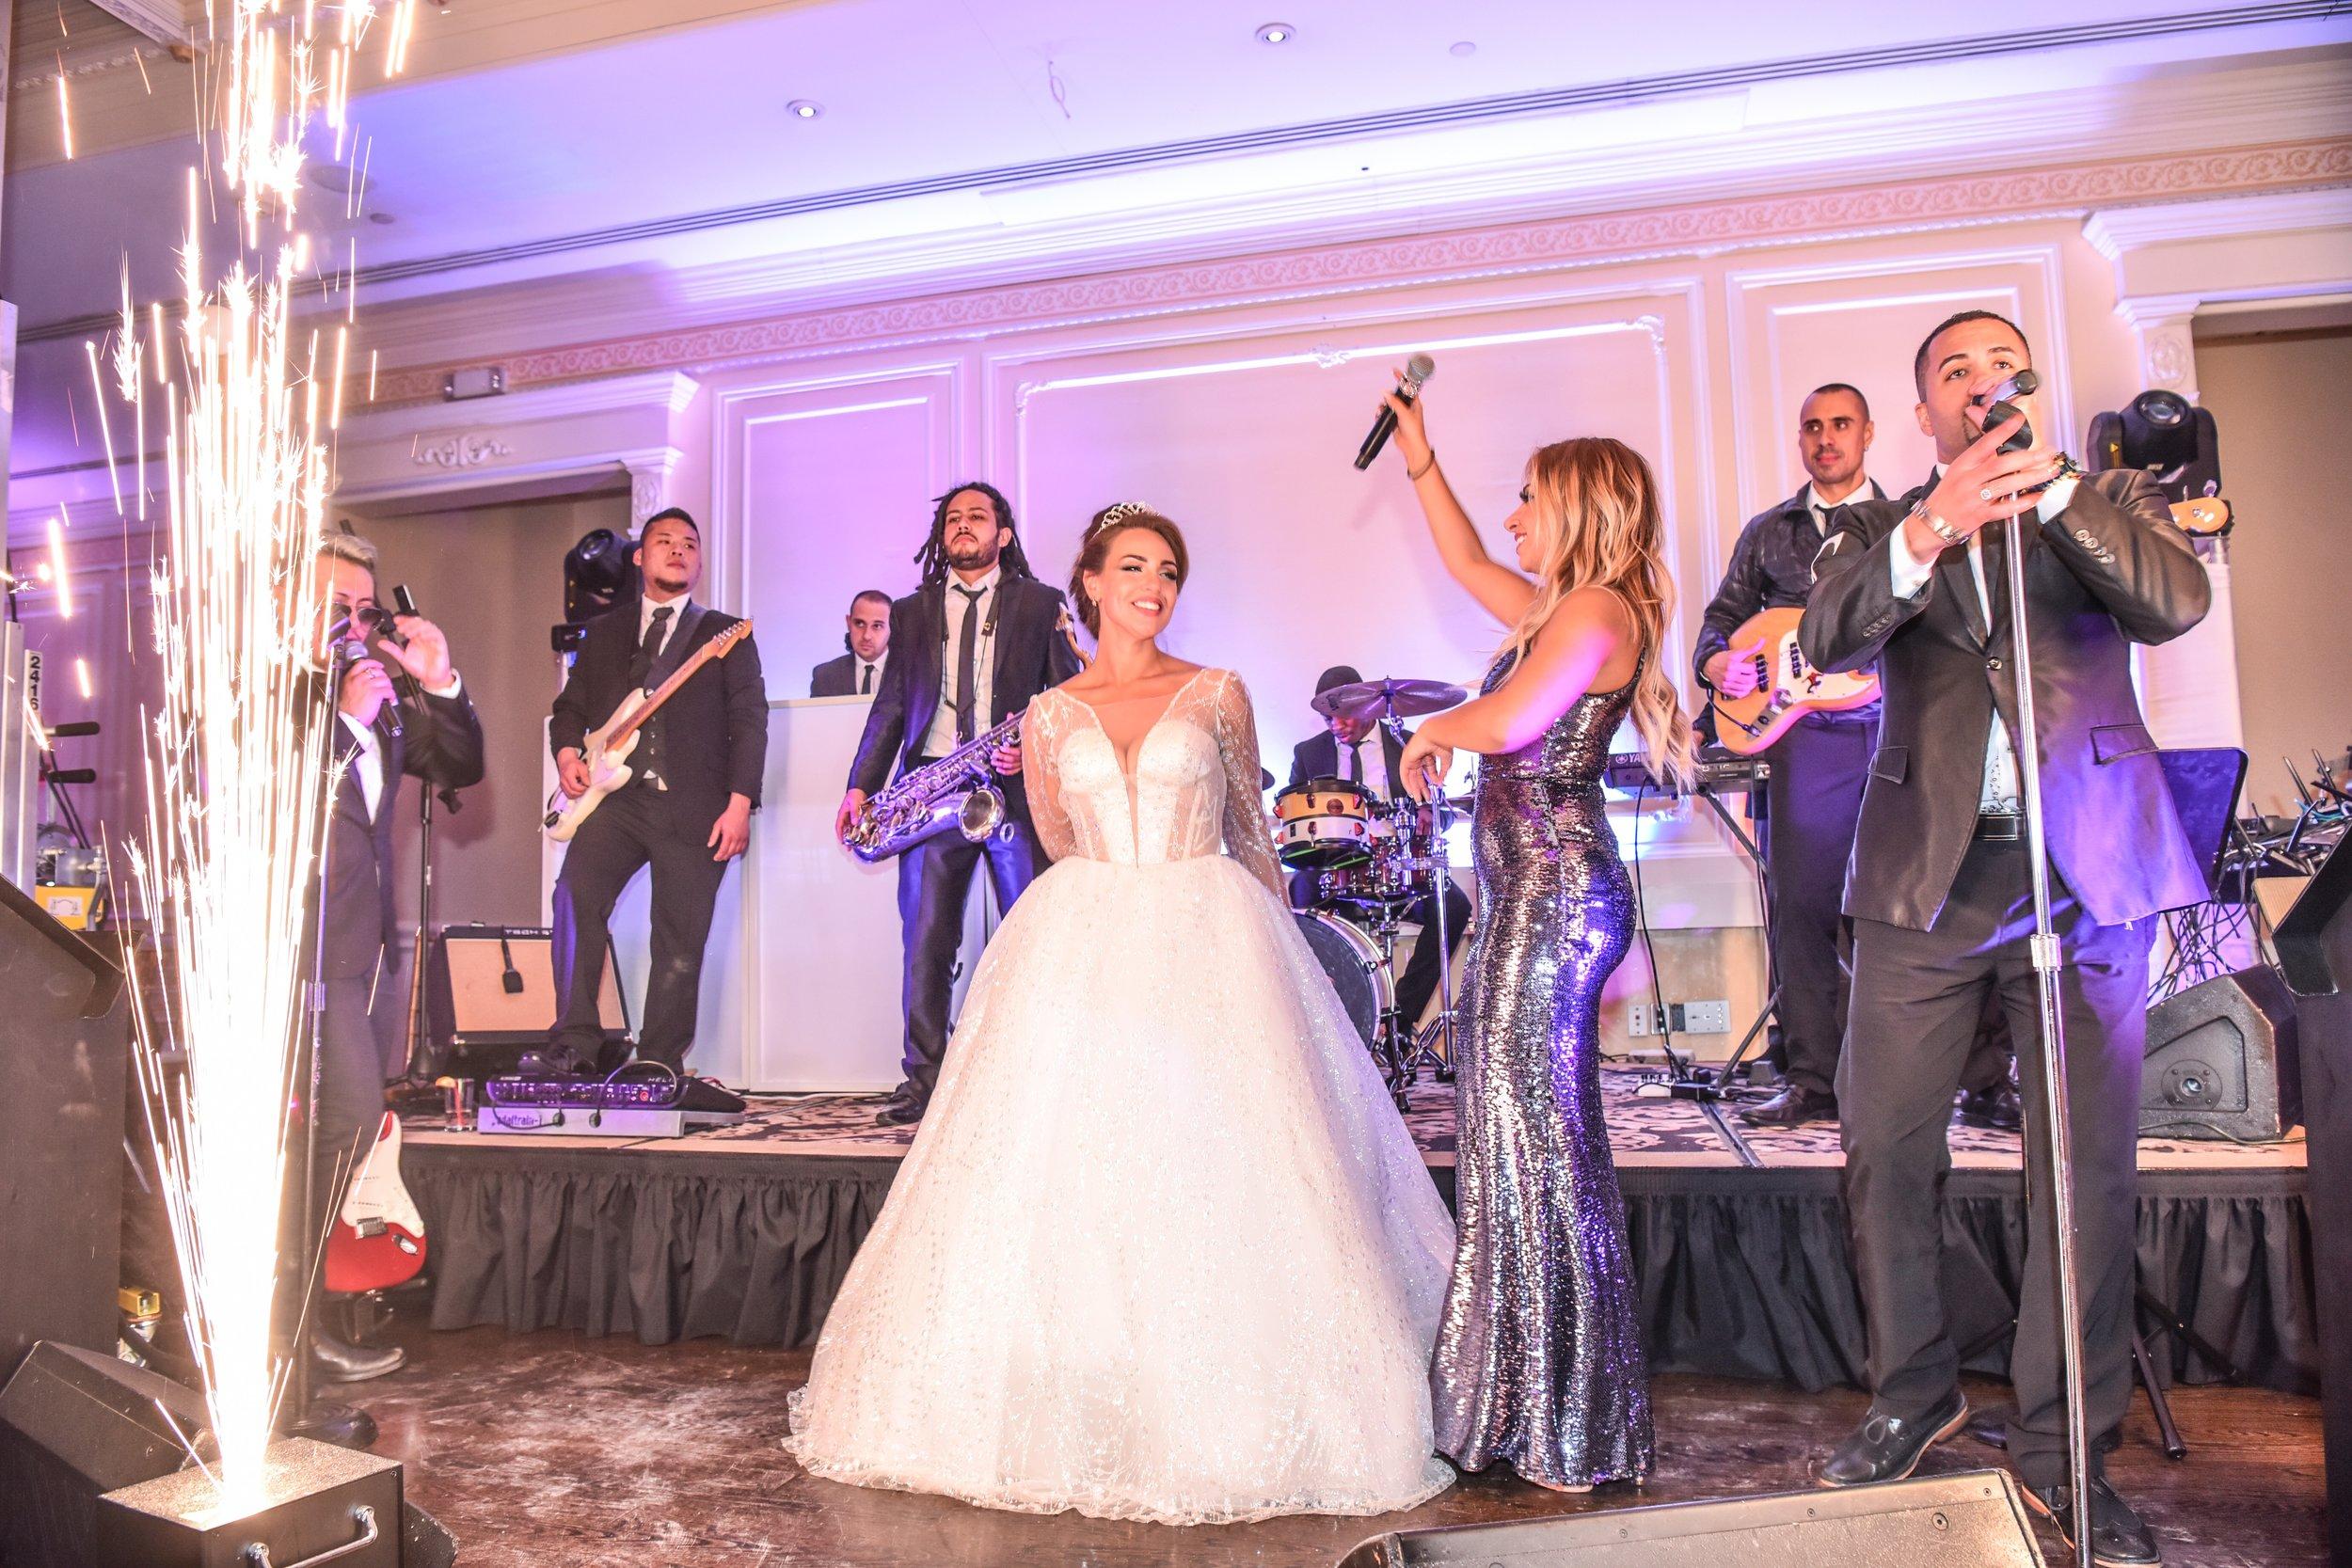 alex_edge_ti_fusion_ny_wedding_4.JPG